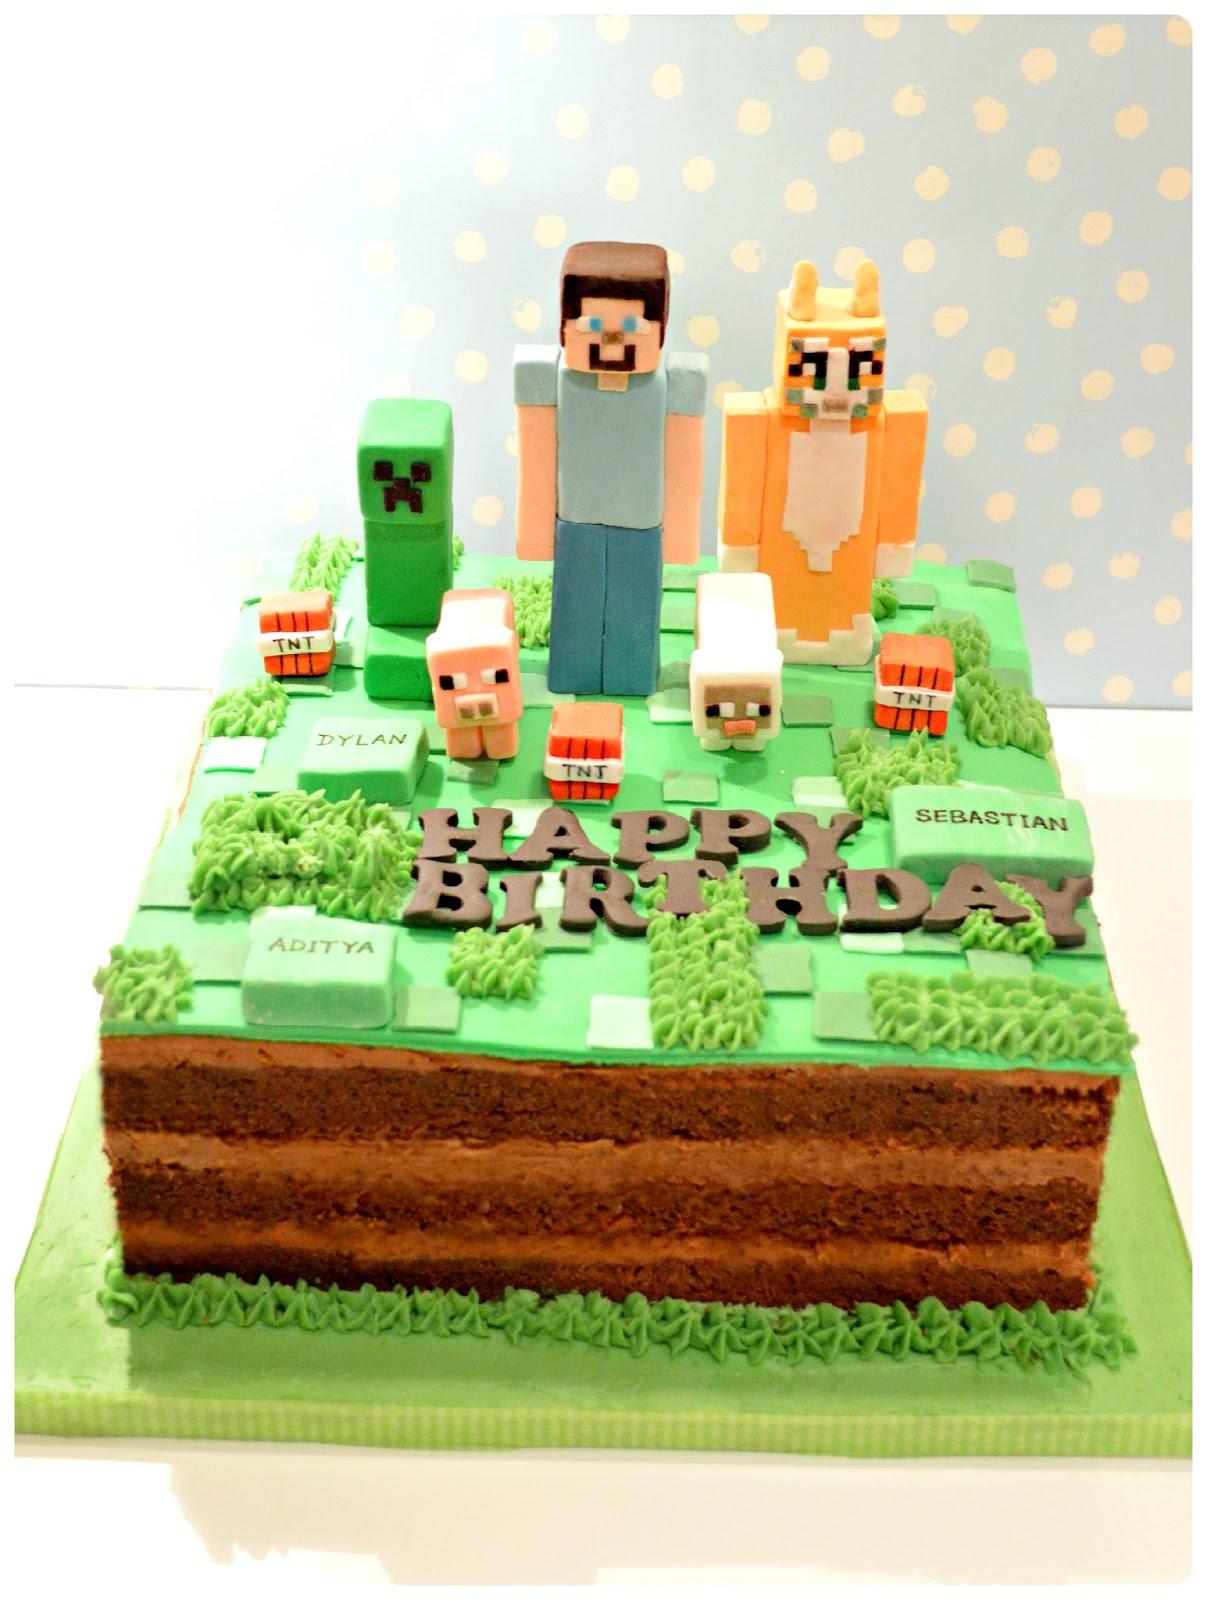 Minecraft Creepy, Steve and Stampy Cat Birthday Cake London Cherie Kelly